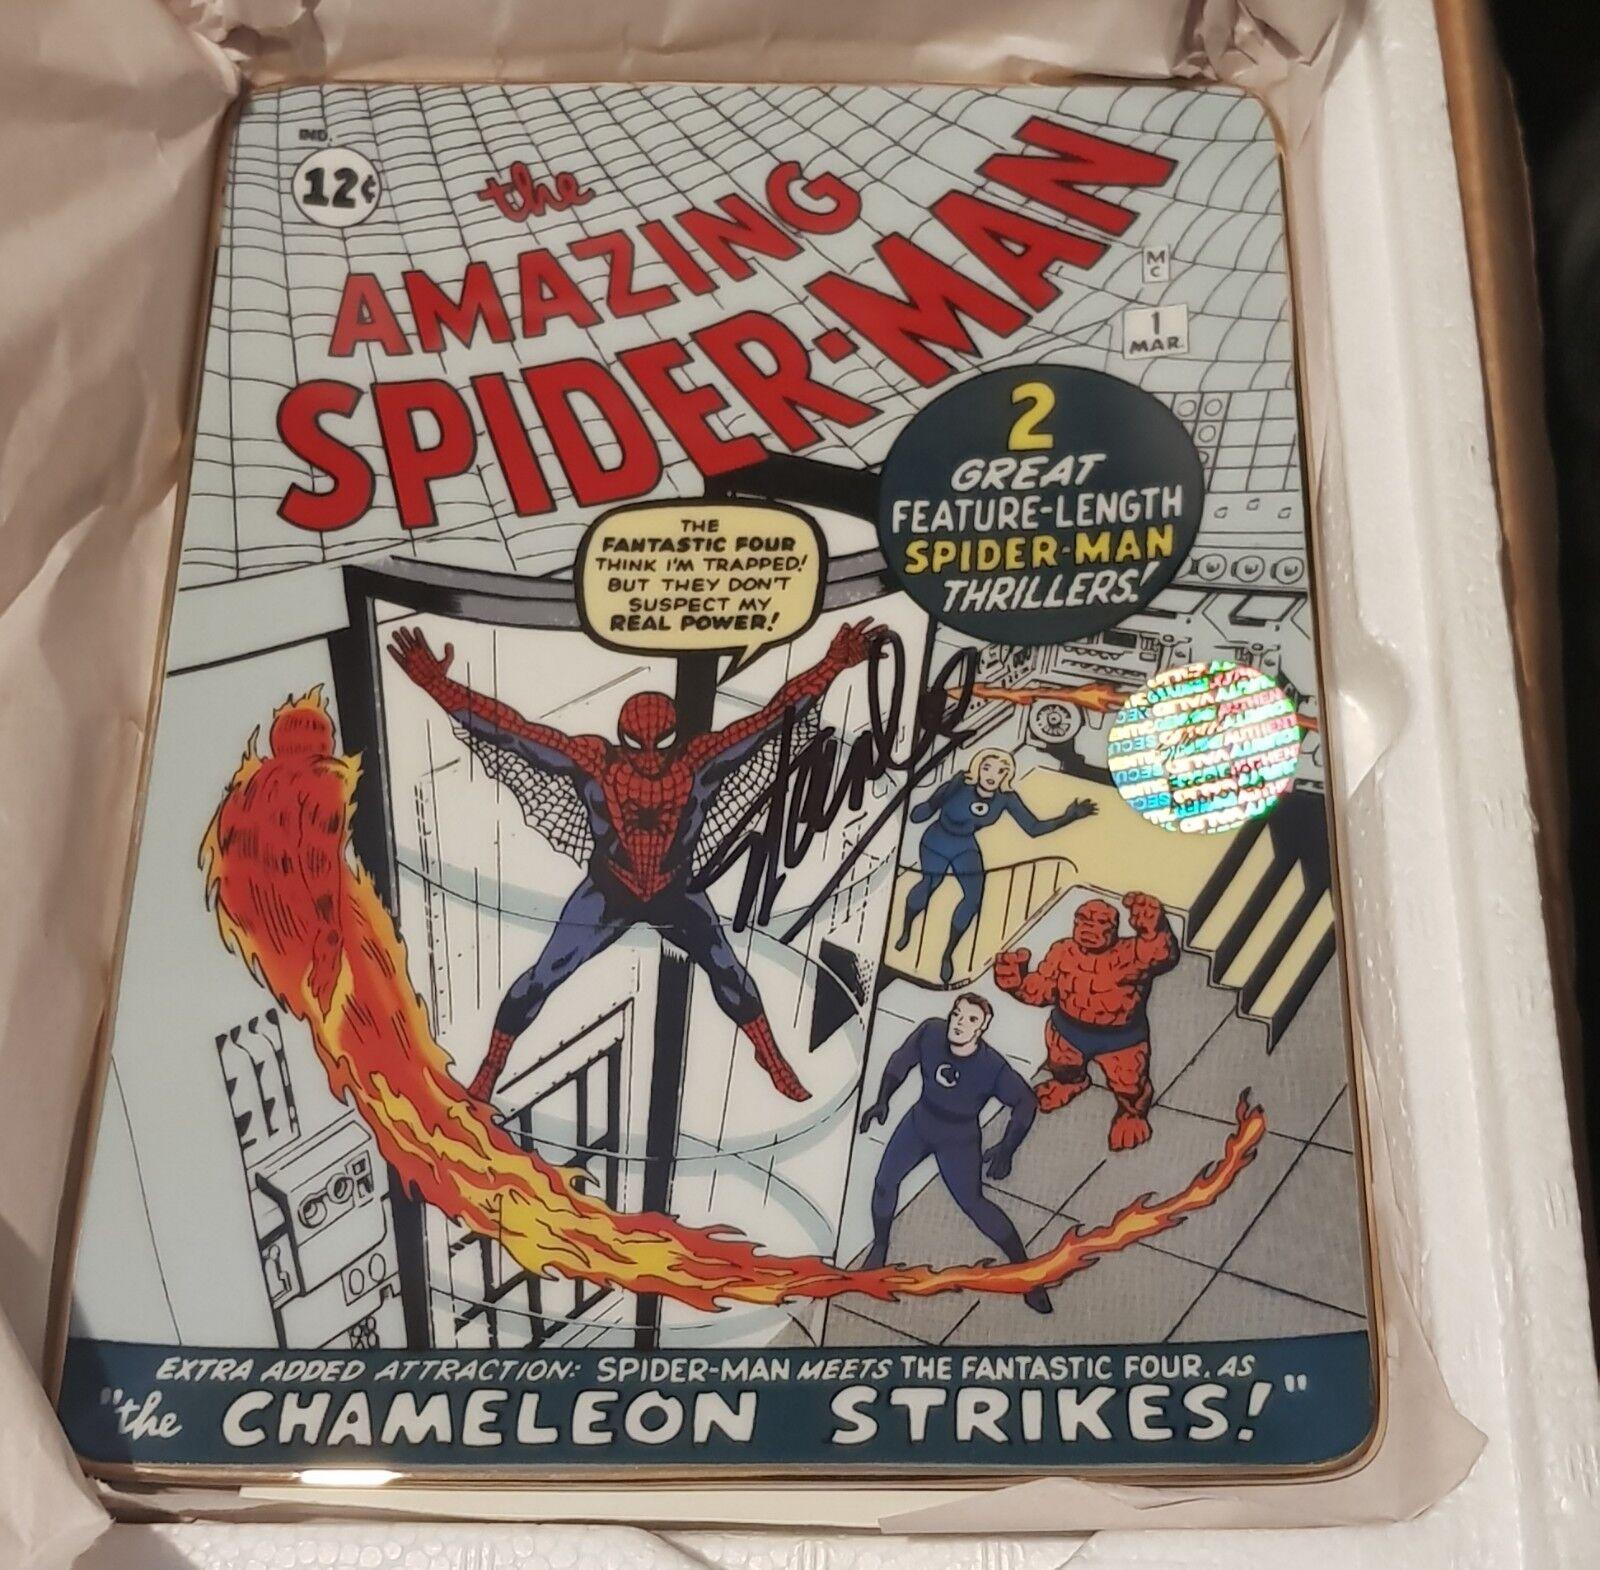 MARVEL STAN LEE signed THE AMAZING SPIDER-MAN  1 Franklin Comme neuf Chameleon grèves